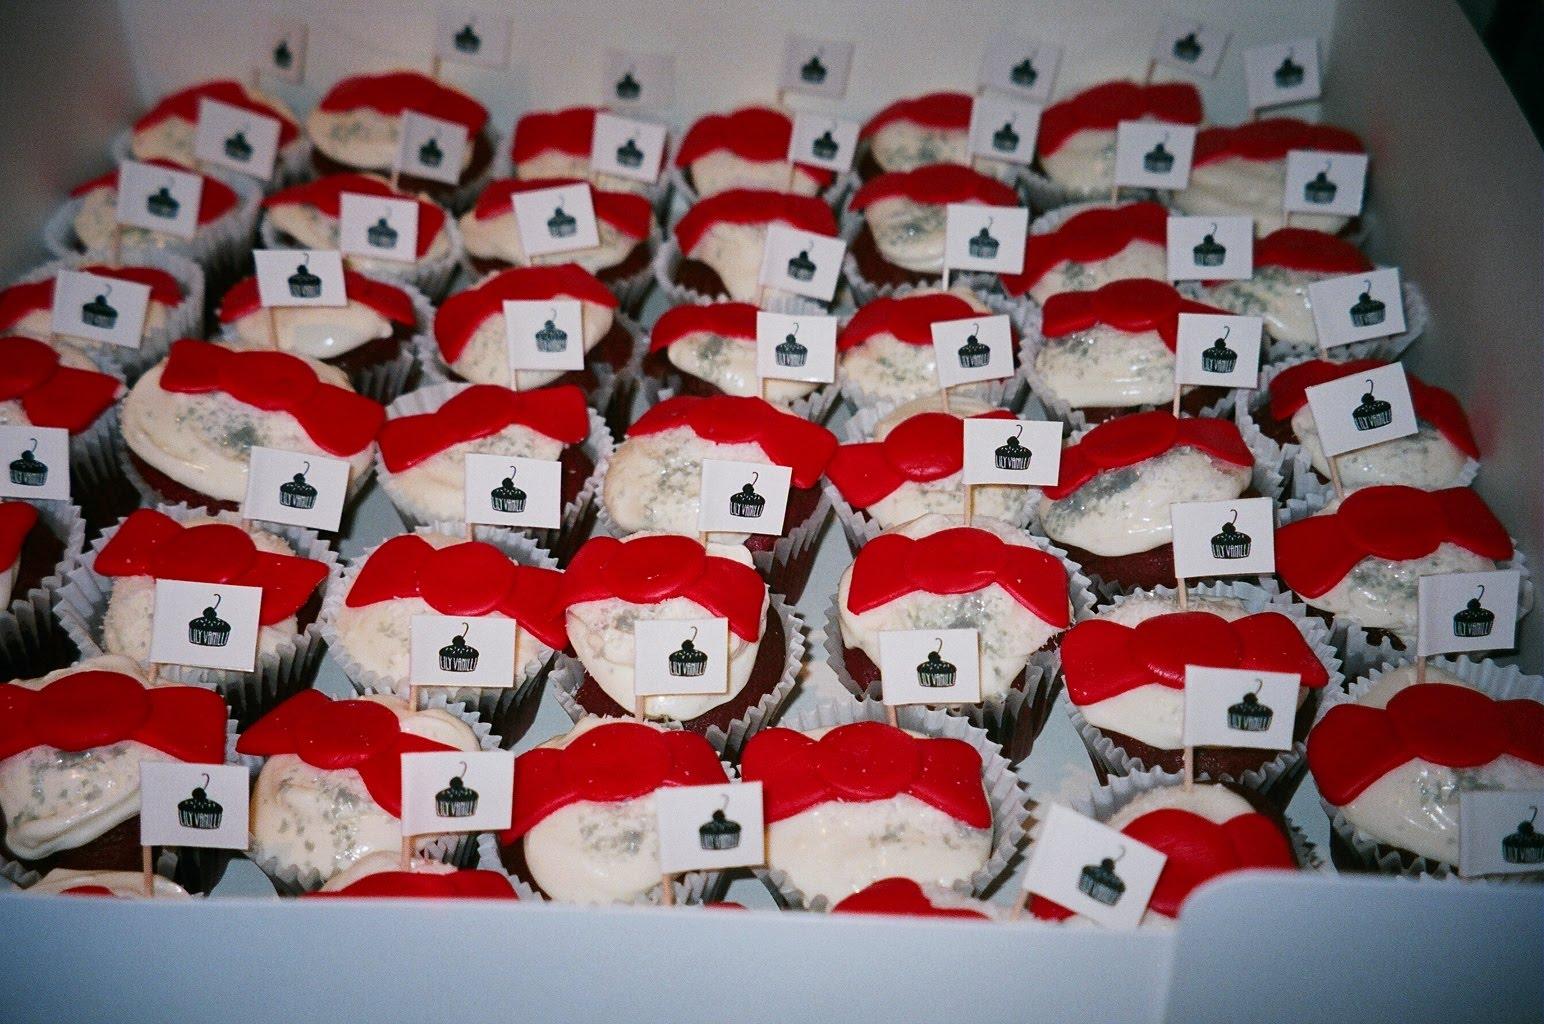 35th Birthday Cake Ideas For Men 12847 35th Birthday Cake